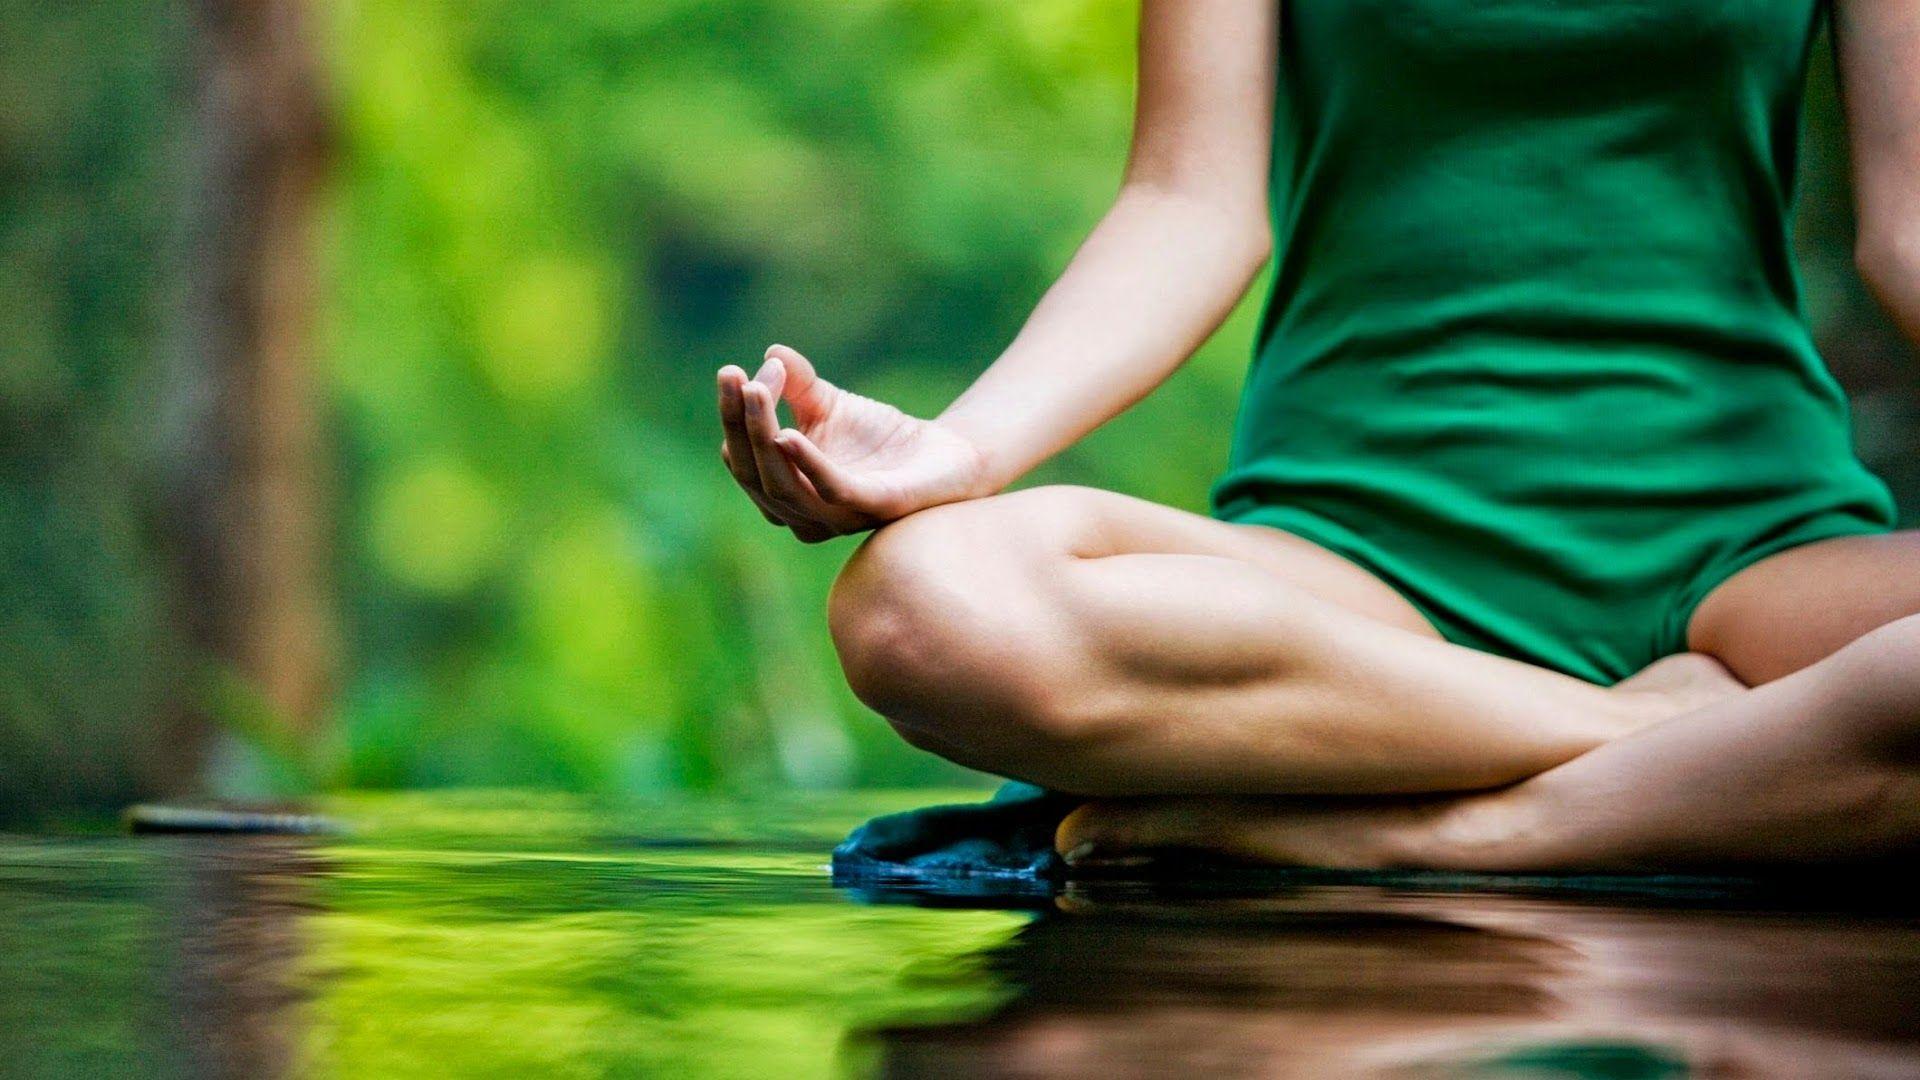 Meditation wallpaper photo